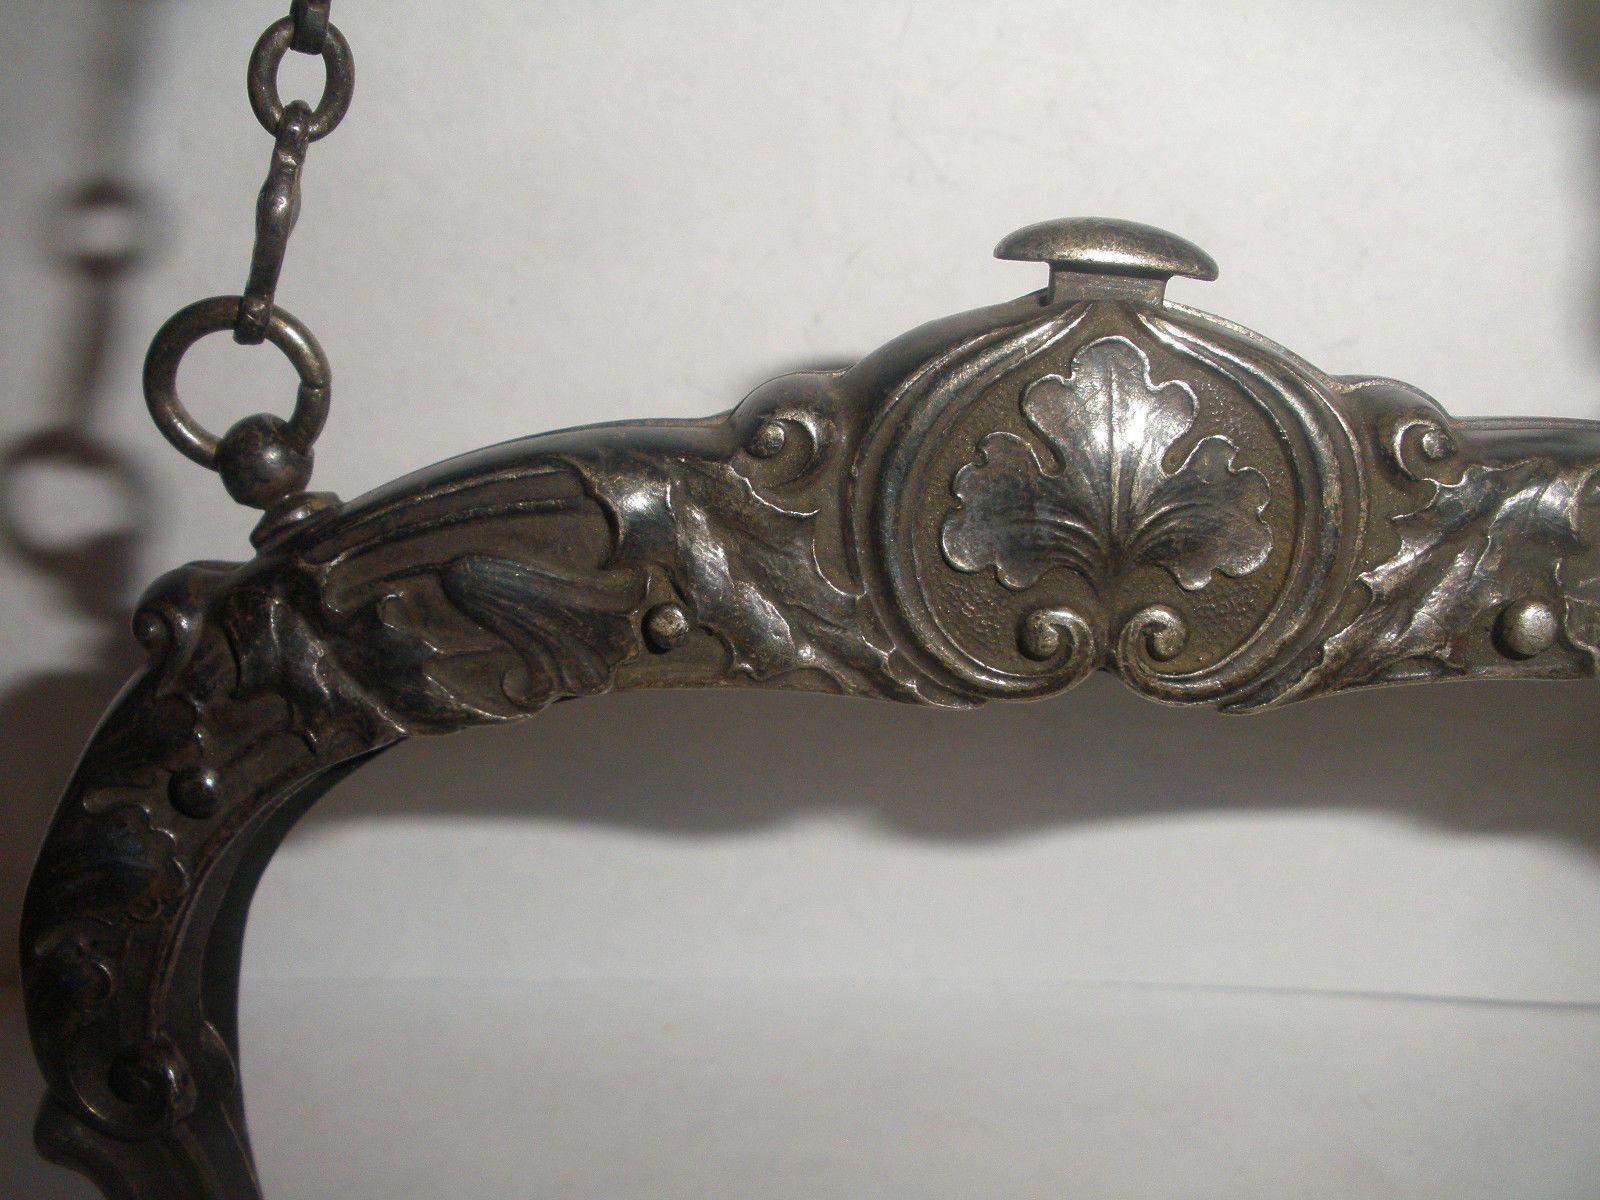 Details About Antique Gorham Sterling Silver Art Nouveau Purse Frame Chatelaine Aesthetic Silver Art Art Nouveau Chatelaine